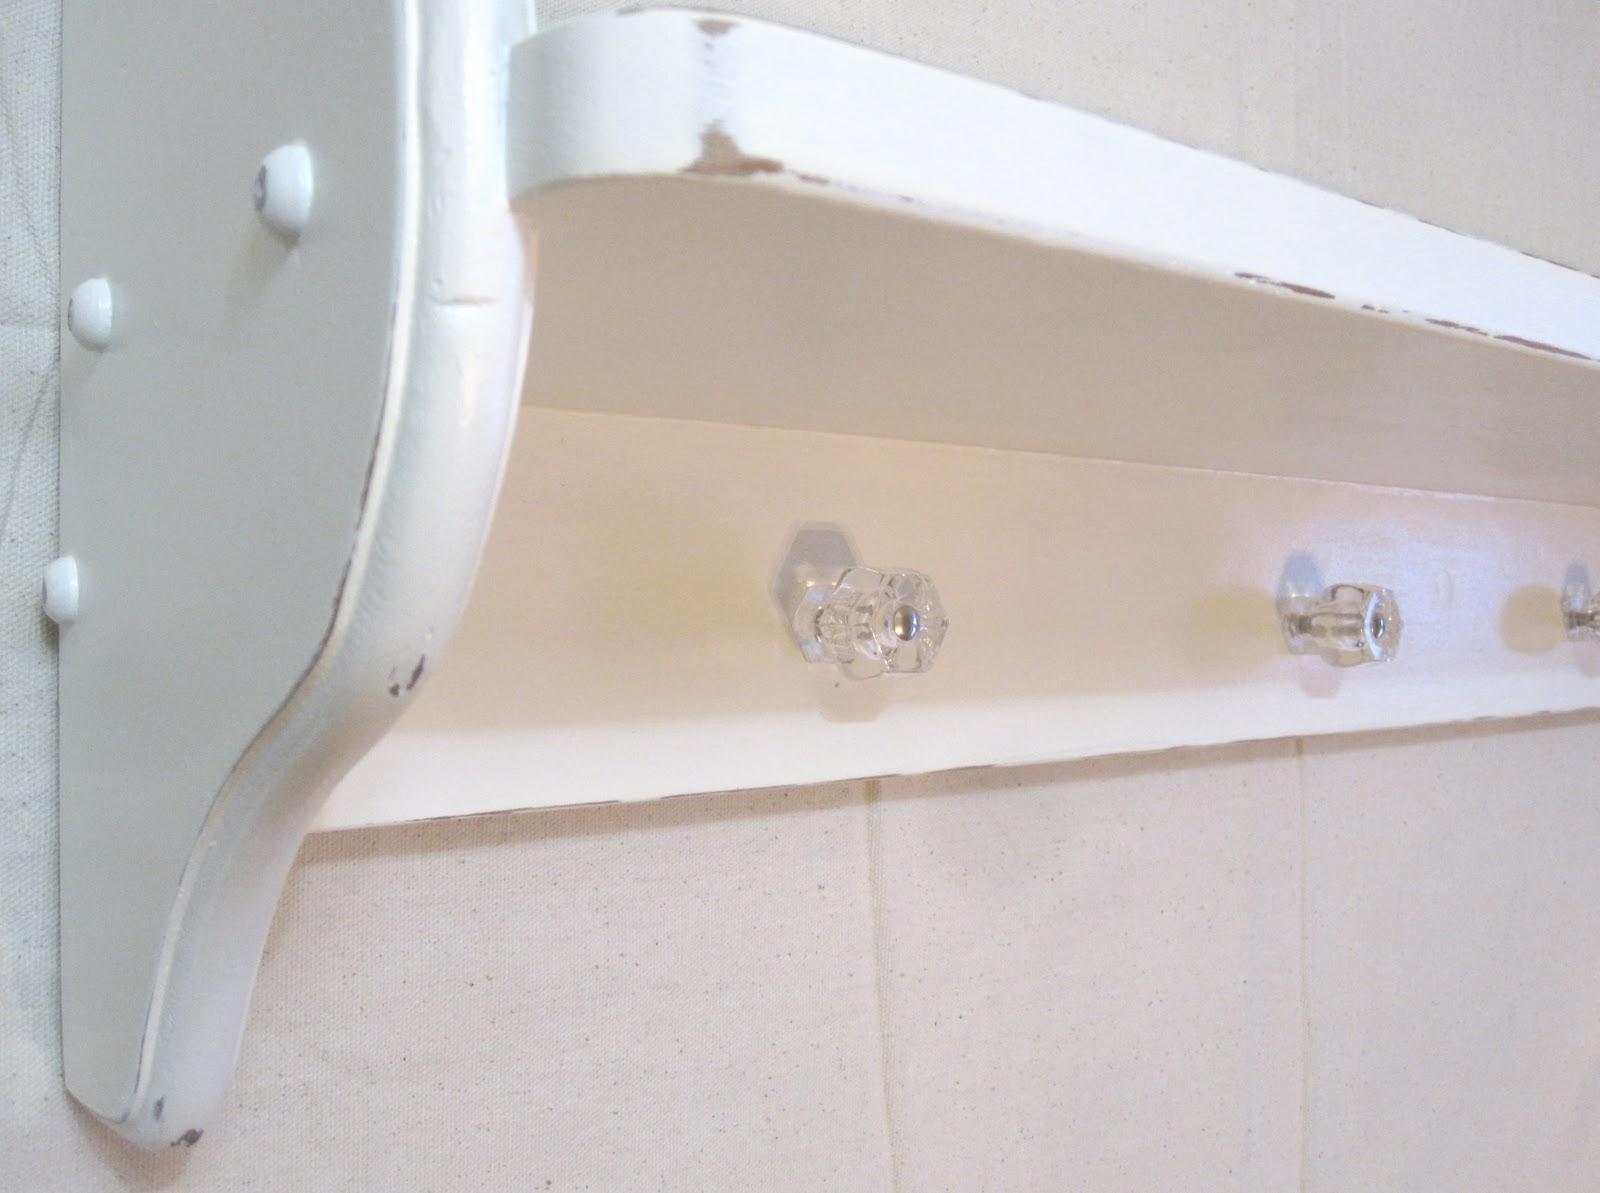 sweet tree furniture shabby chic shelf. Black Bedroom Furniture Sets. Home Design Ideas